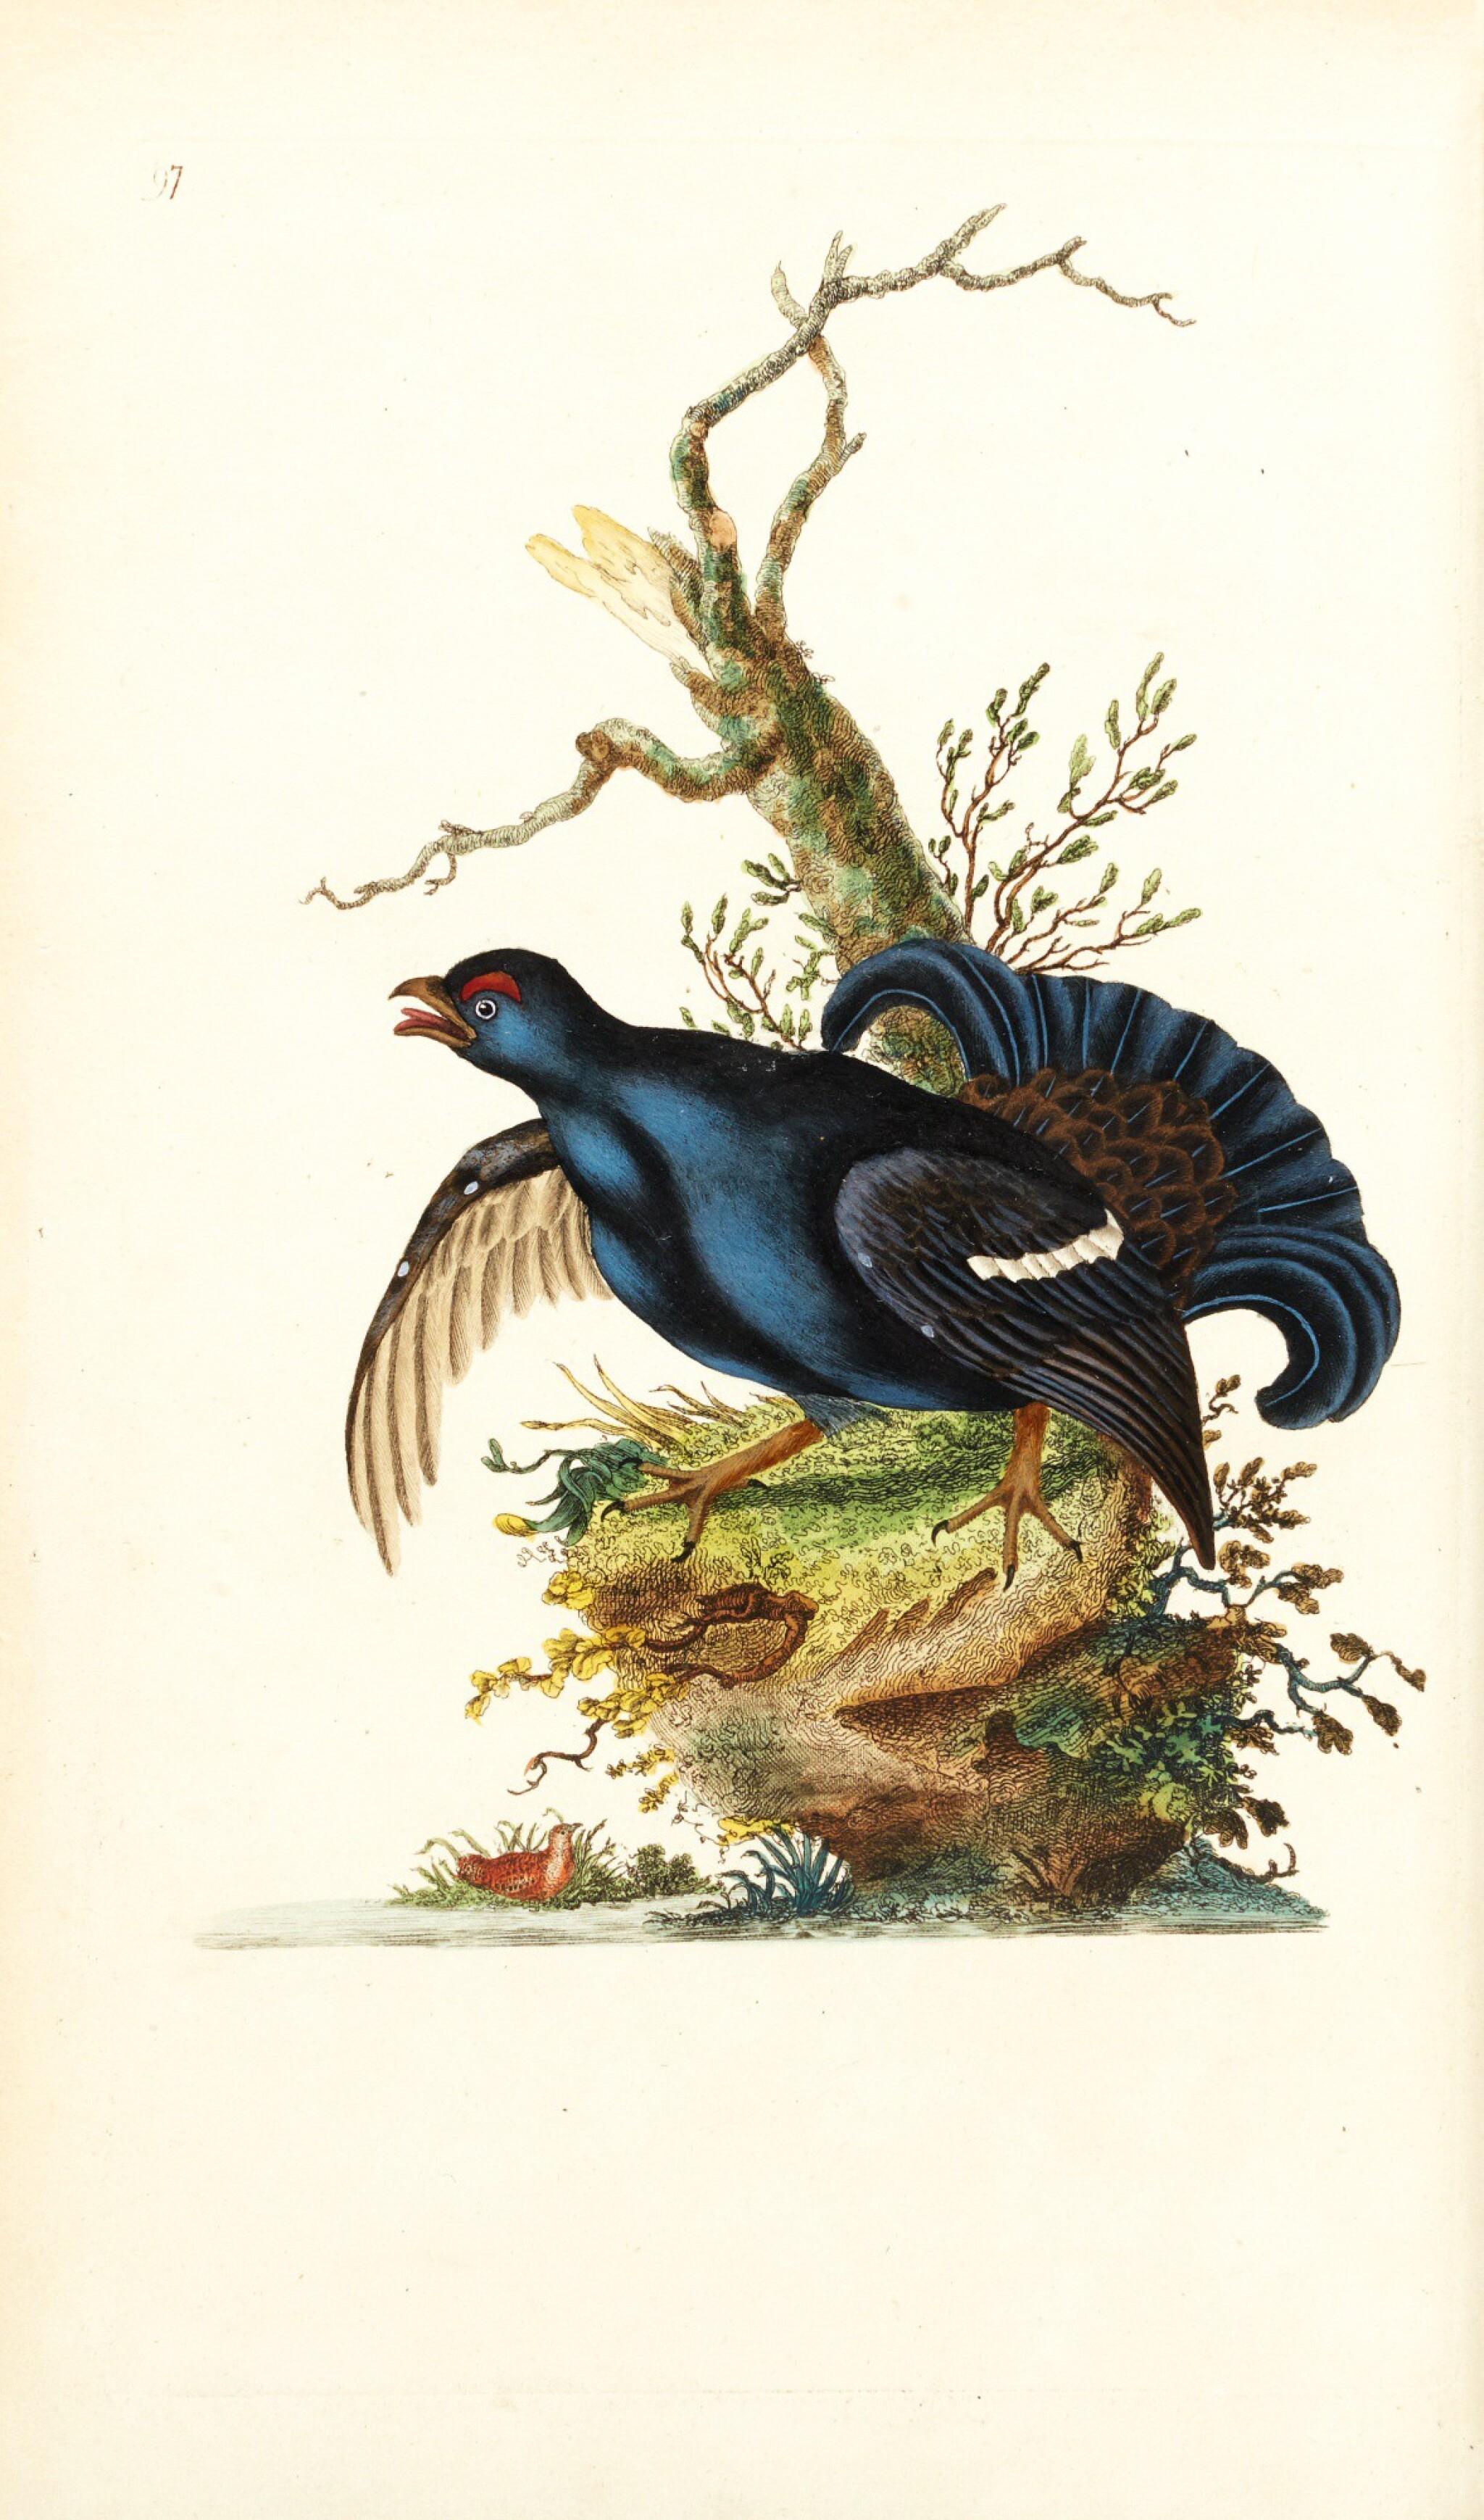 View full screen - View 1 of Lot 7. Donovan | The Natural History of British Birds. London, 1799-1819, 10 volumes.